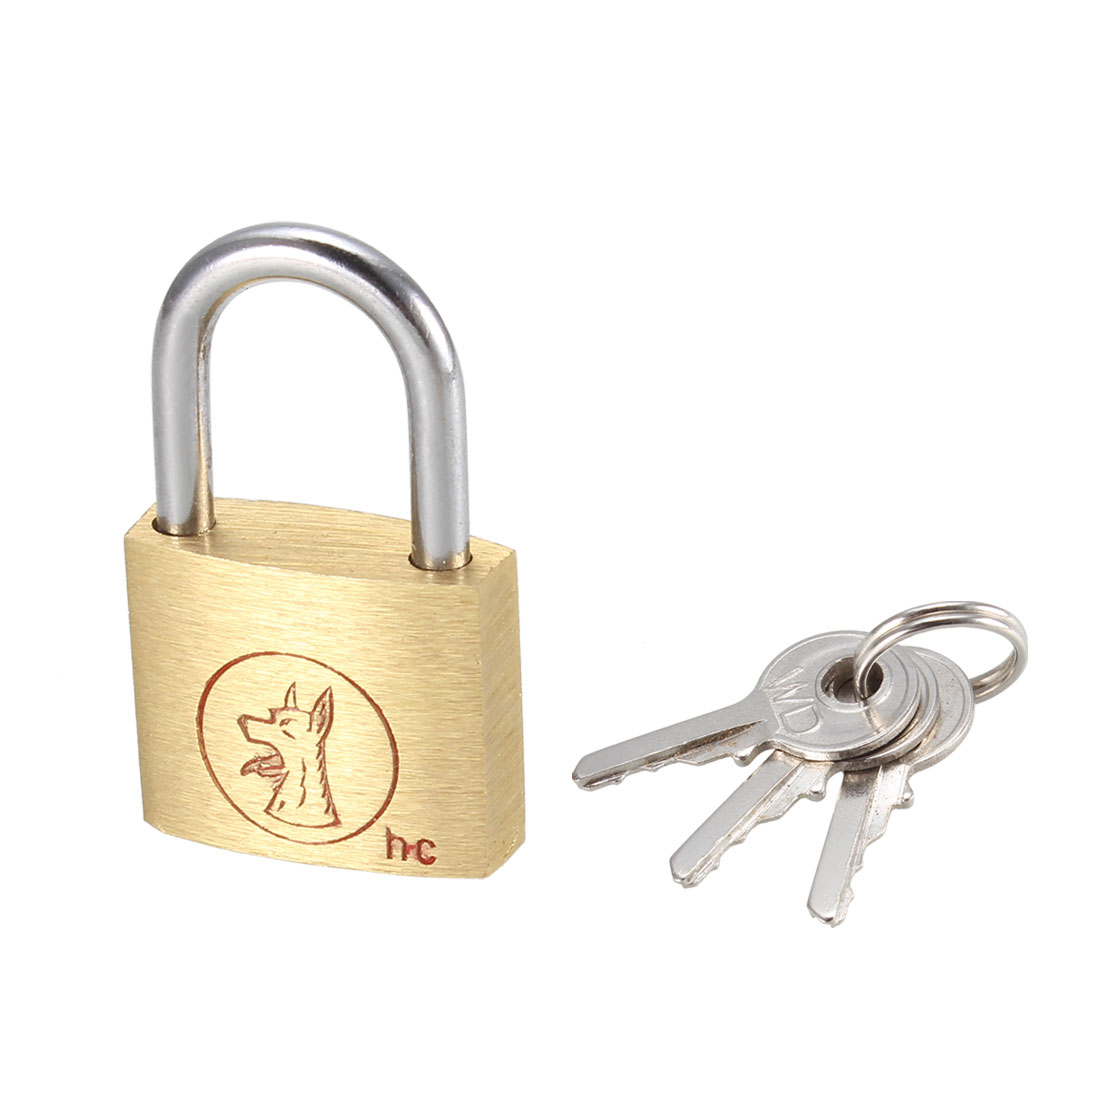 Mini Size Security Brass Door Lock Padlock with 3 Keys